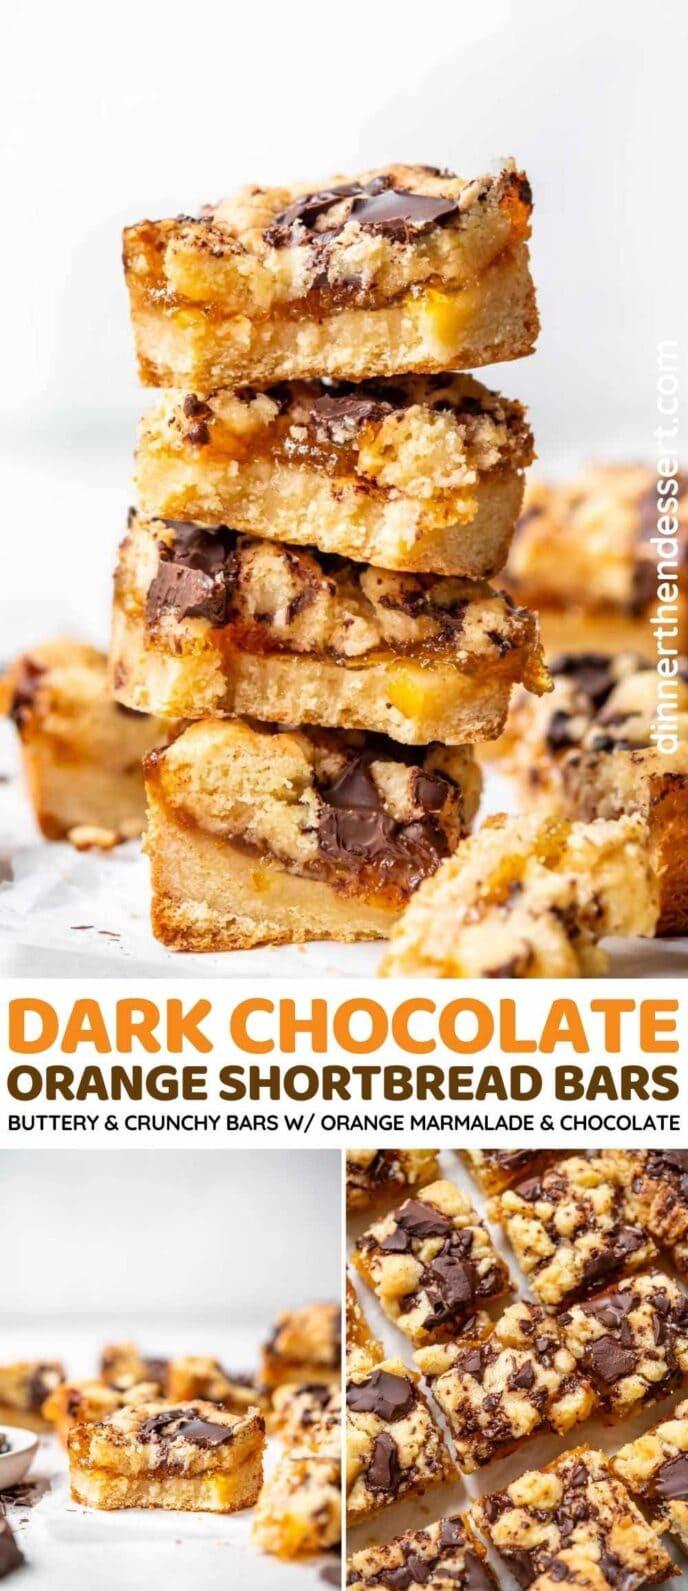 Dark Chocolate Orange Shortbread Bars collage